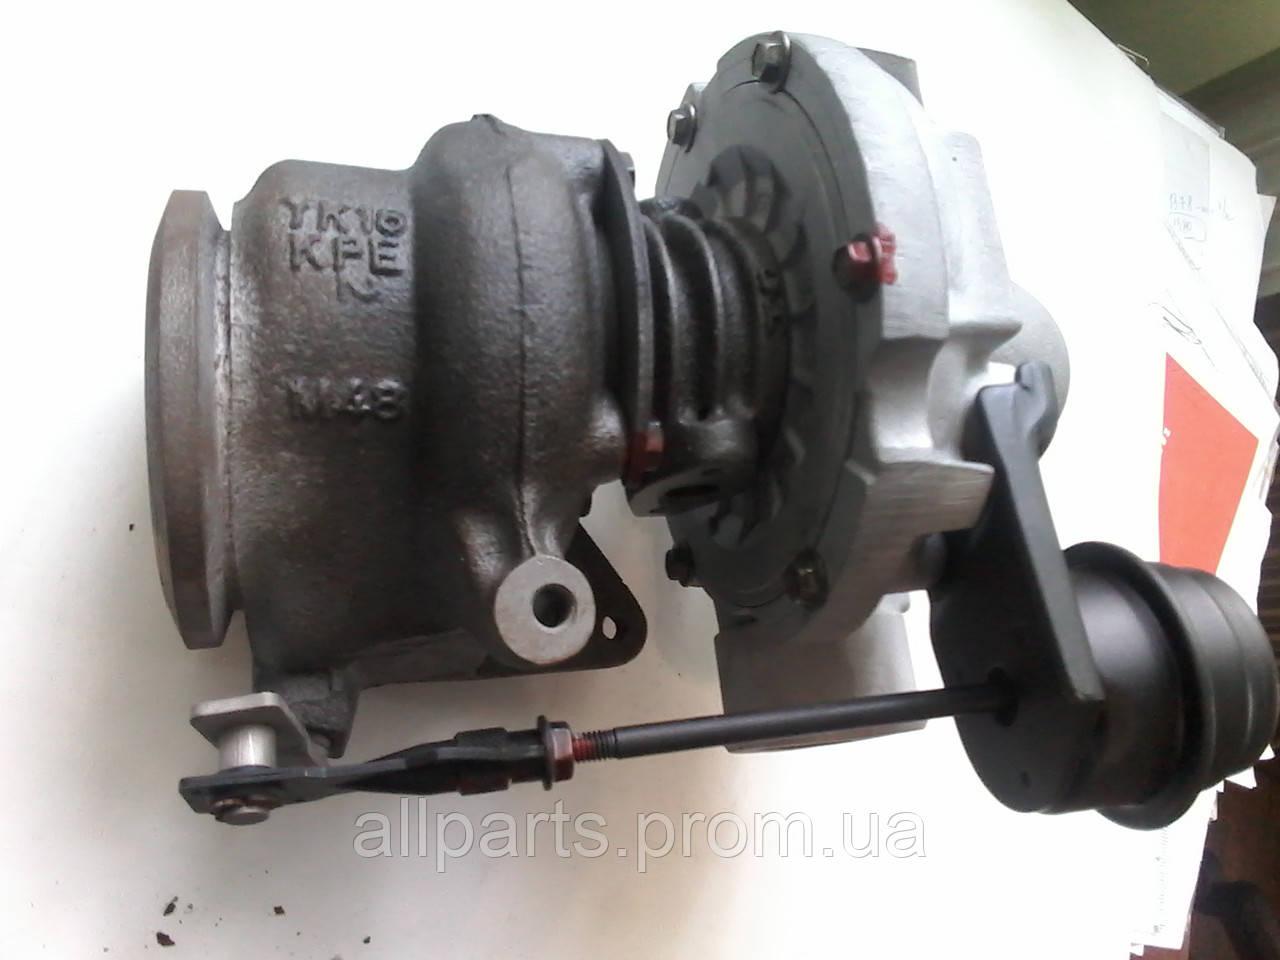 Турбина Volkswagen Golf 2, Jetta 2 - VAG 068145703L , б/у реставрированная